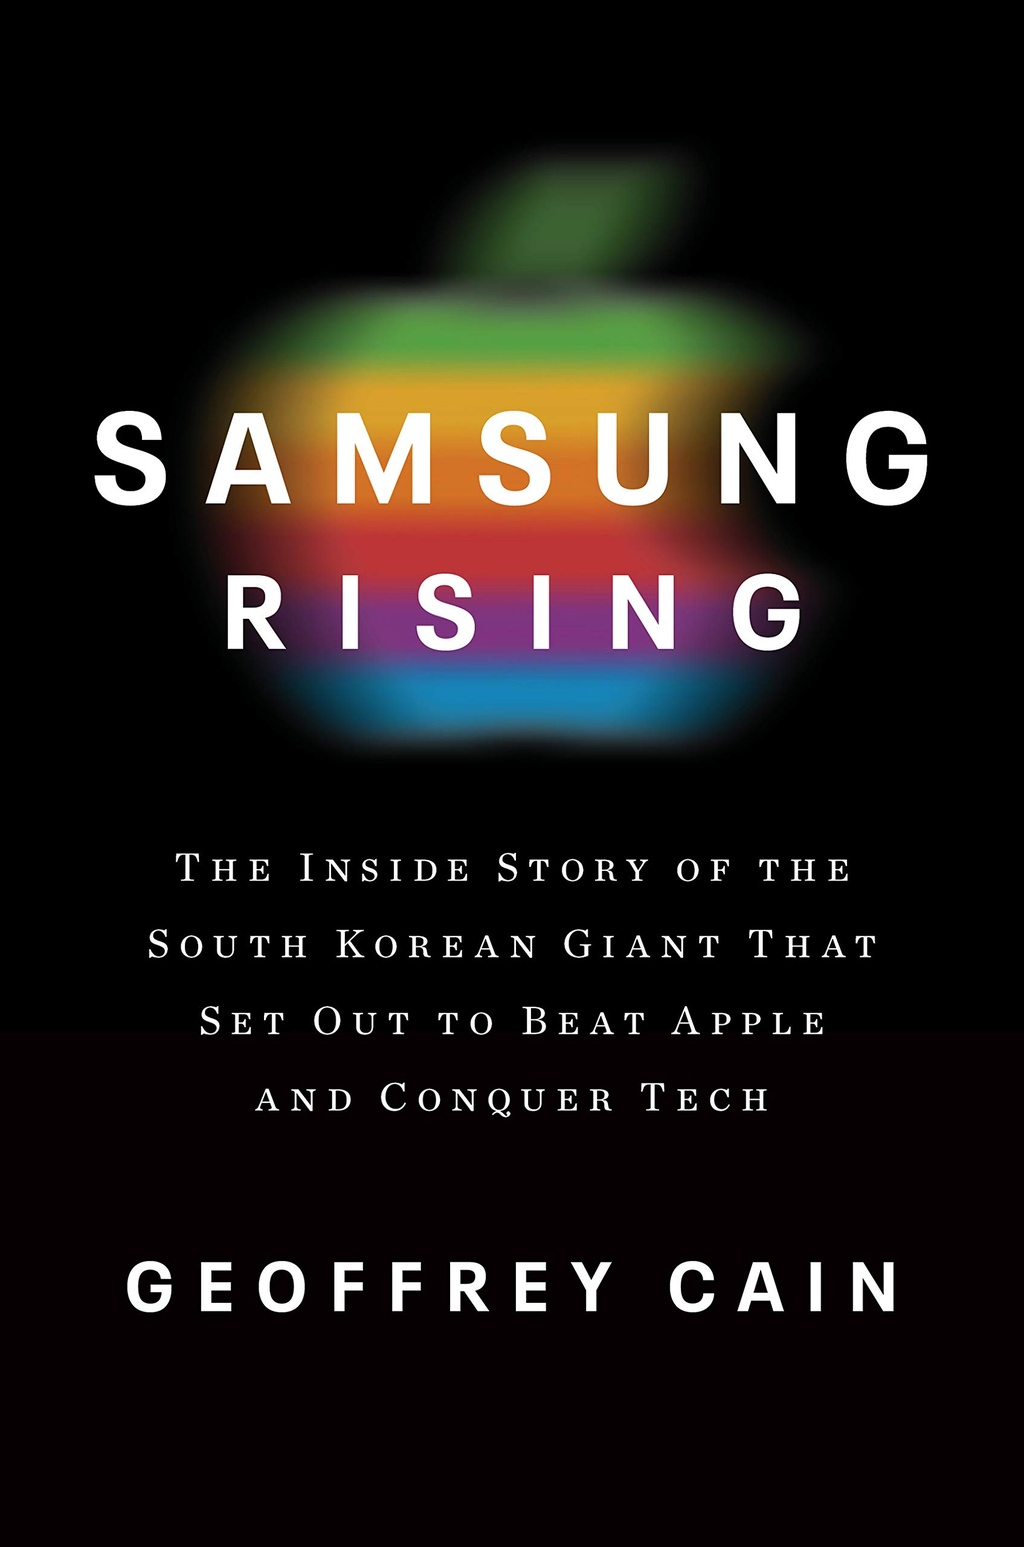 'Samsung Rising': Quyen luc va su troi day cua gia toc Lee hinh anh 1 71nb12I5KNL.jpg